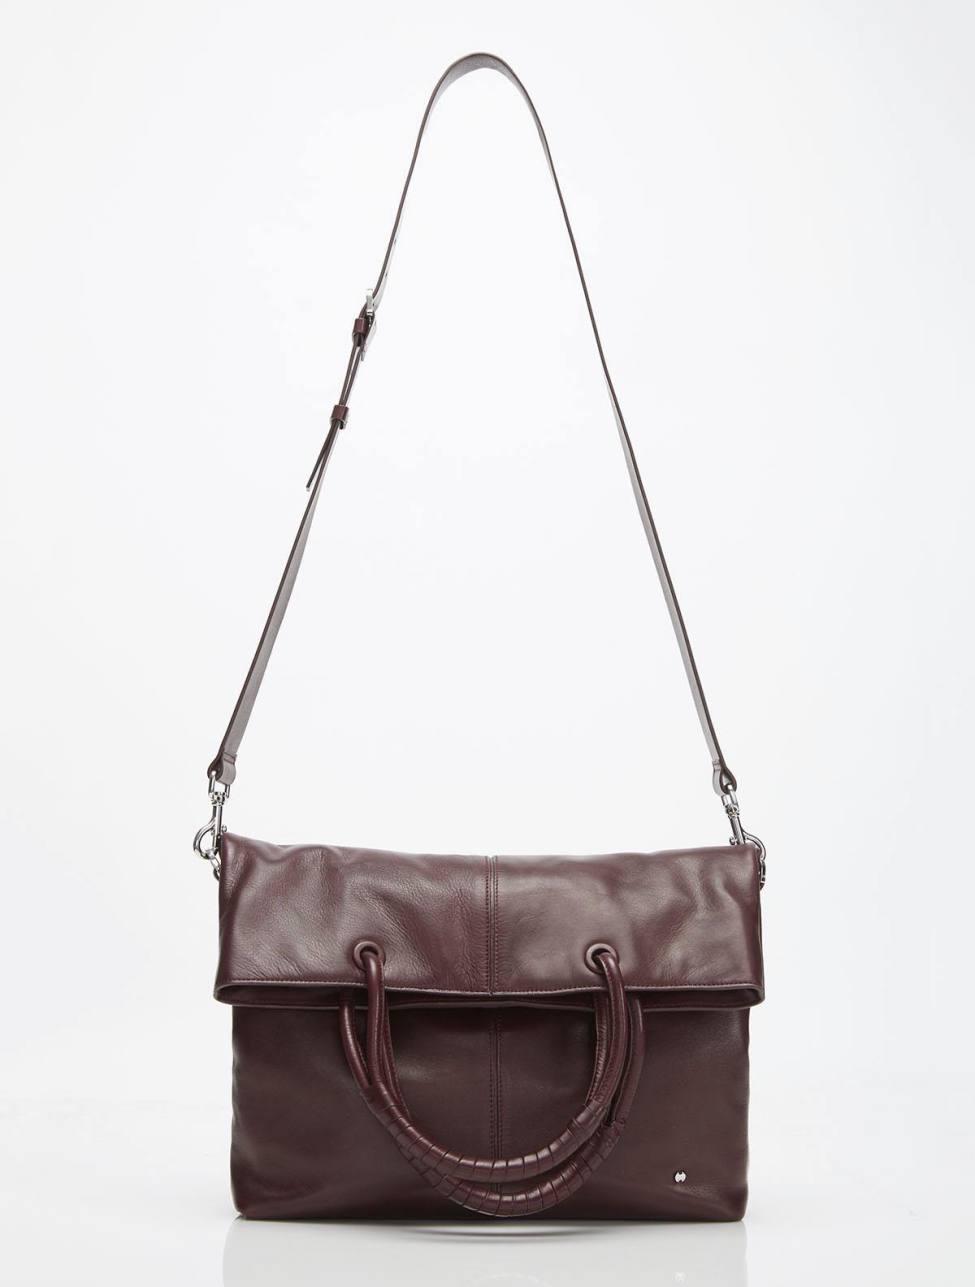 Halston Heritage Ali Soft Box Calf Leather Lg Foldover Tote - Lyst 0a088a5e8ef24